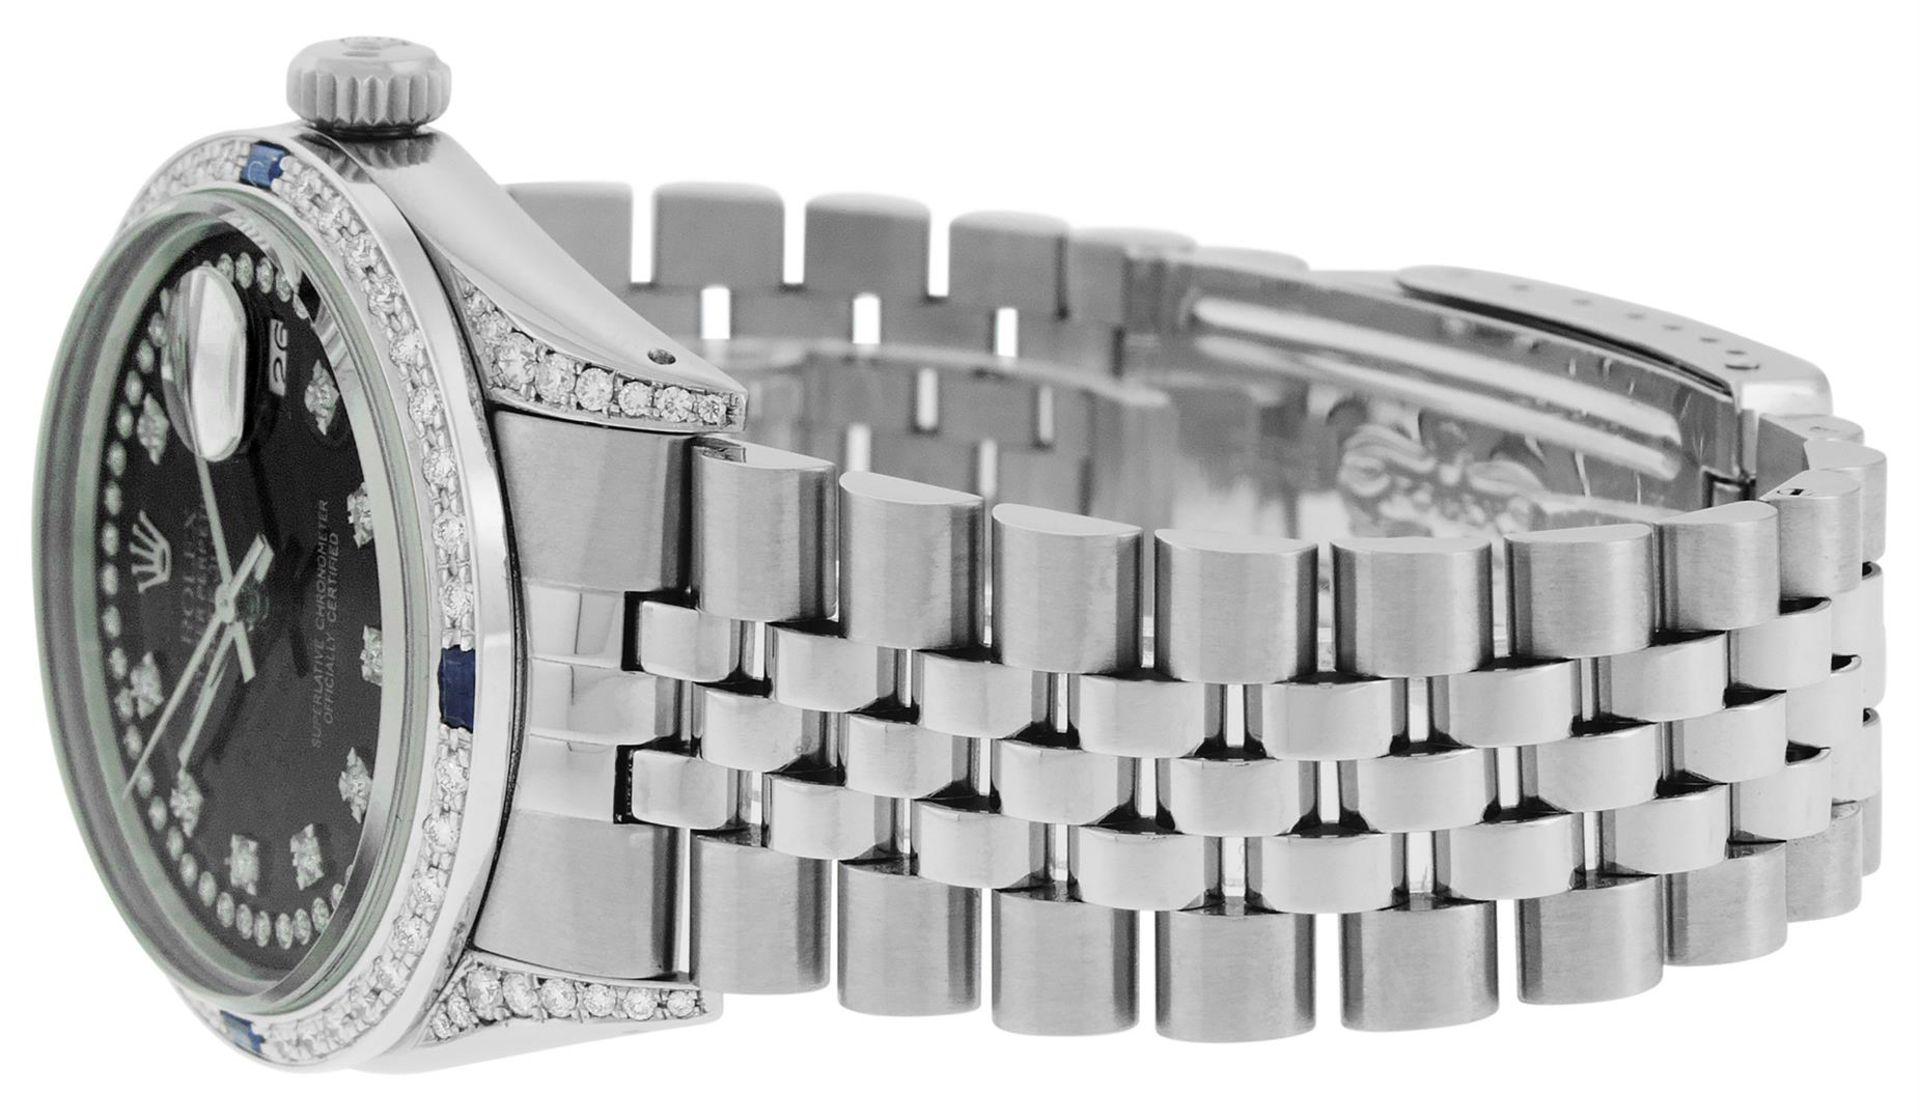 Rolex Mens Stainless Steel Black Diamond Lugs & Sapphire Datejust Wristwatch Oys - Image 3 of 9